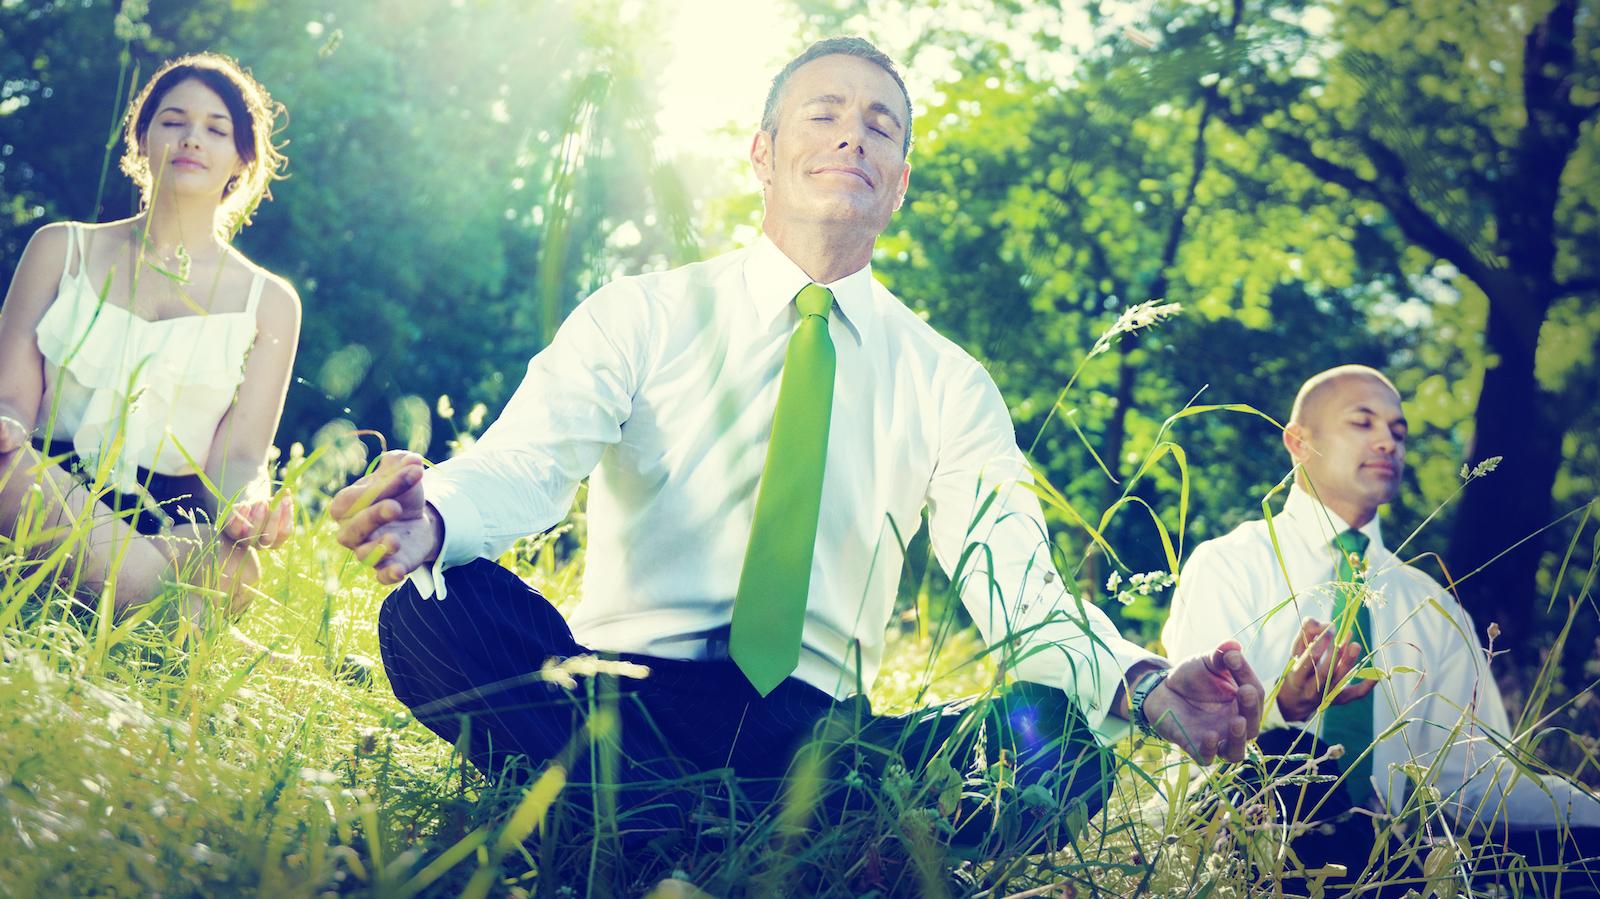 Business people meditating in field. Image: Dreamstime